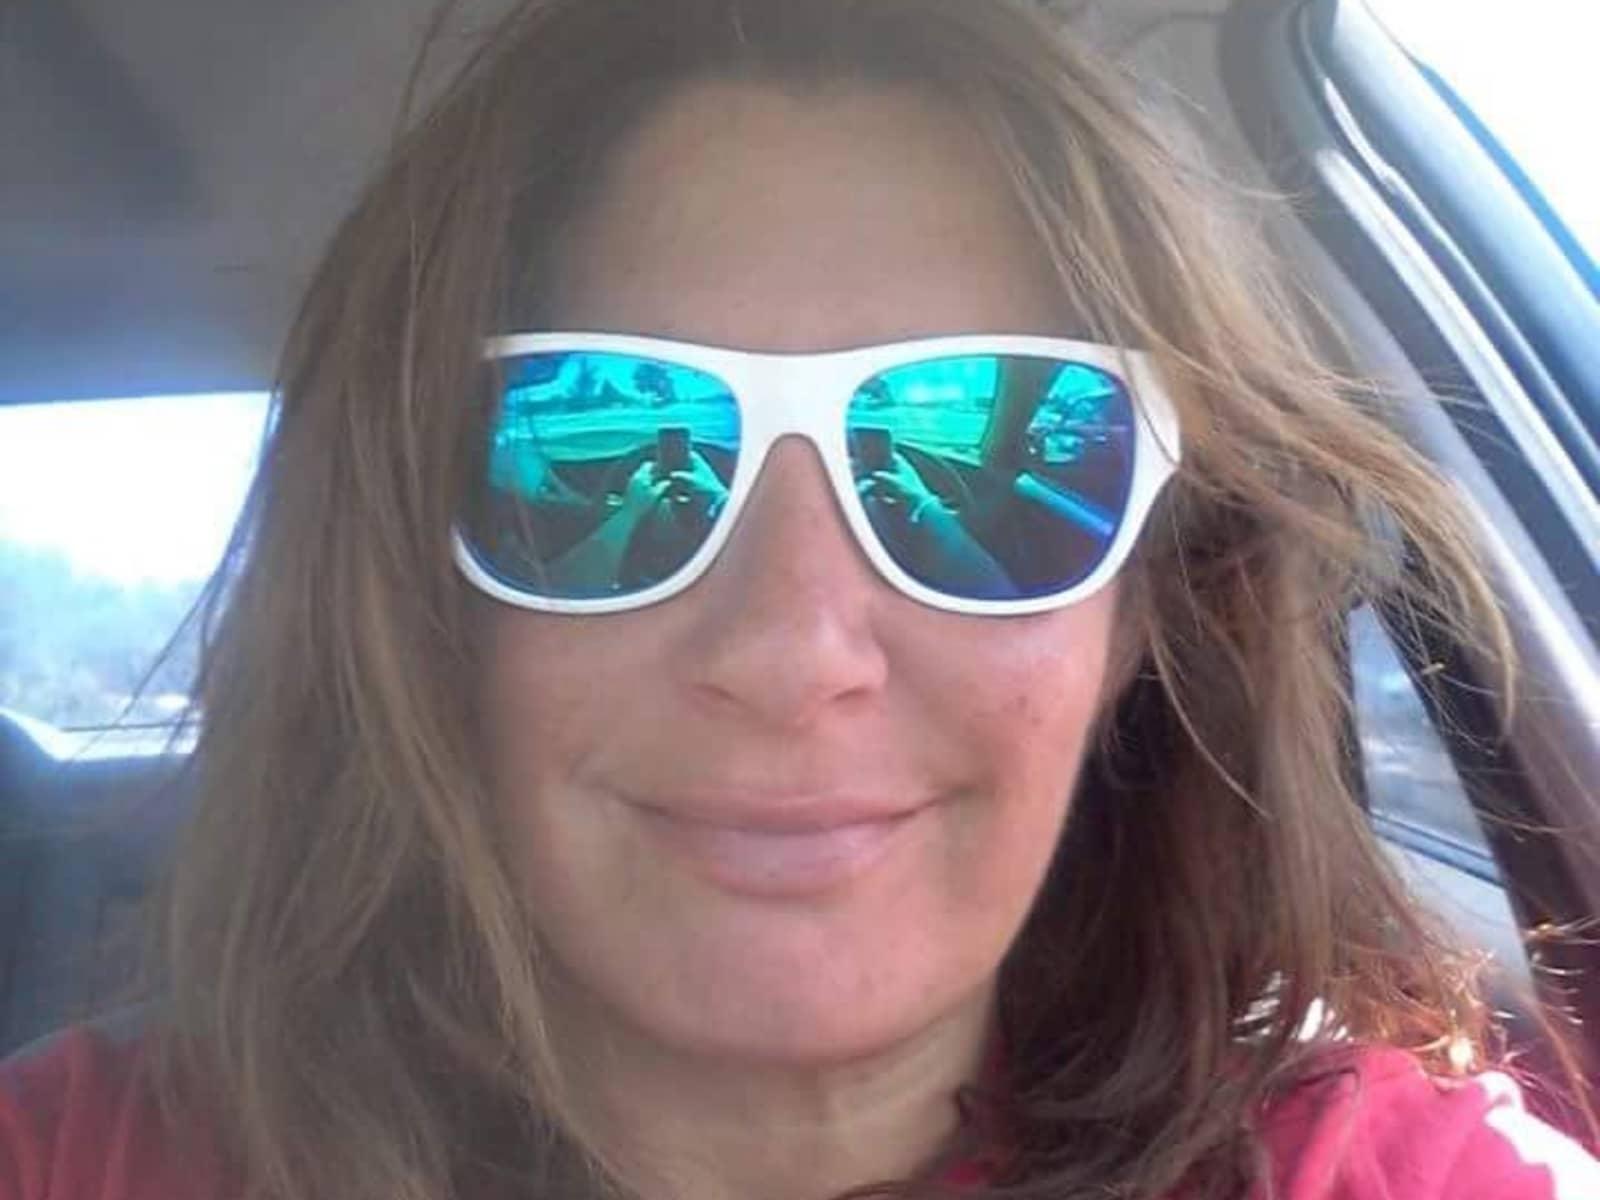 Michele from Newport Beach, California, United States